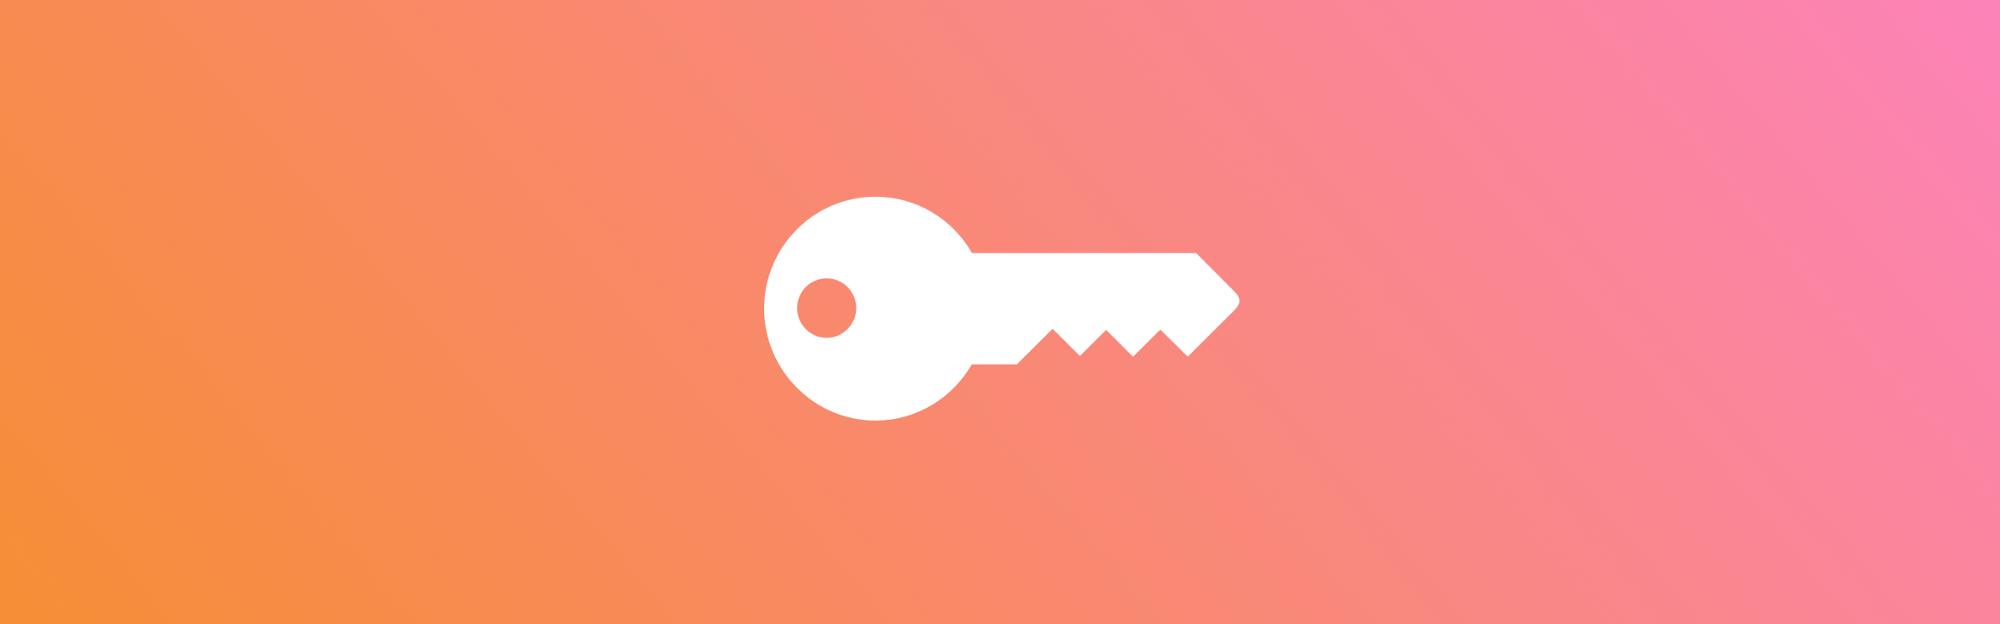 The Key to Unlocking DesignSkills